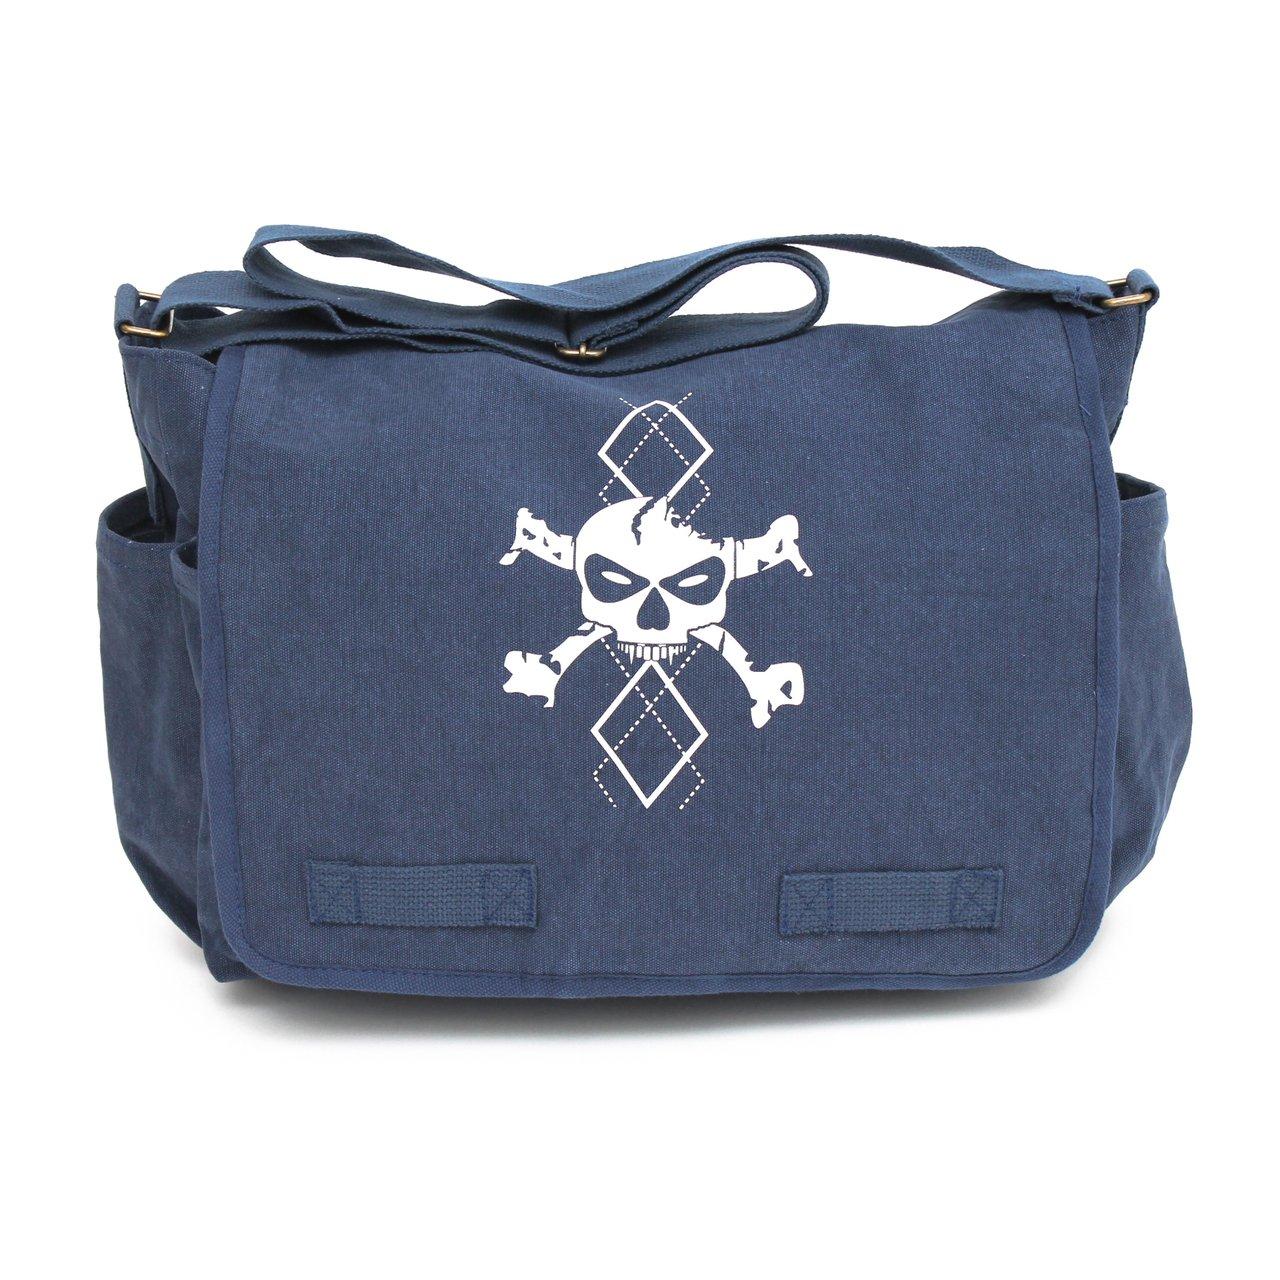 Heavyweight Canvas Messenger Bag Satchel Diaper Bag, Blue with White Argyle Skull